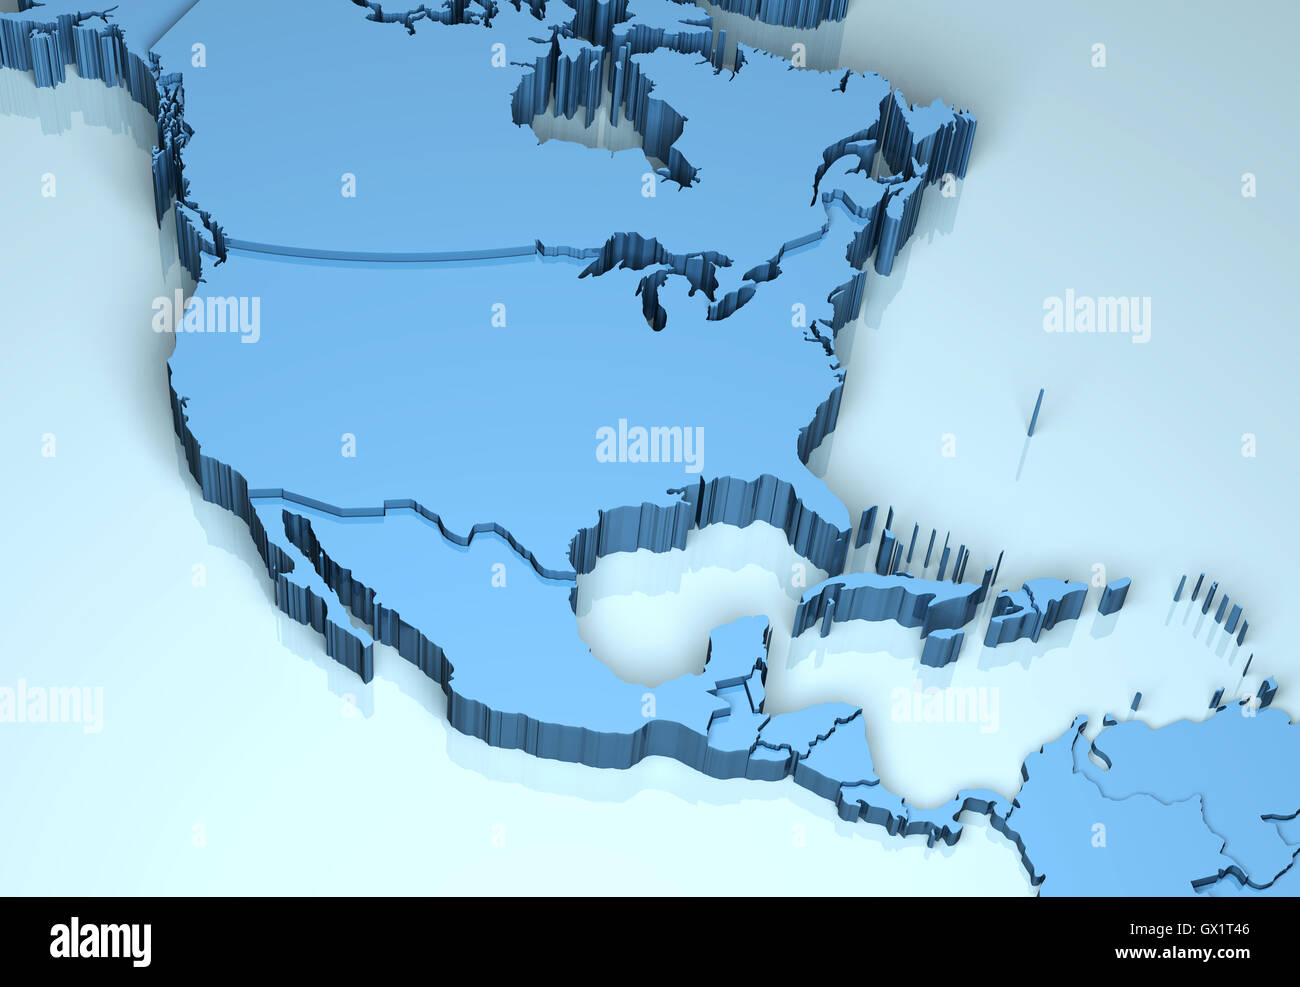 North Central America 3D Stock Photo: 119284150 - Alamy